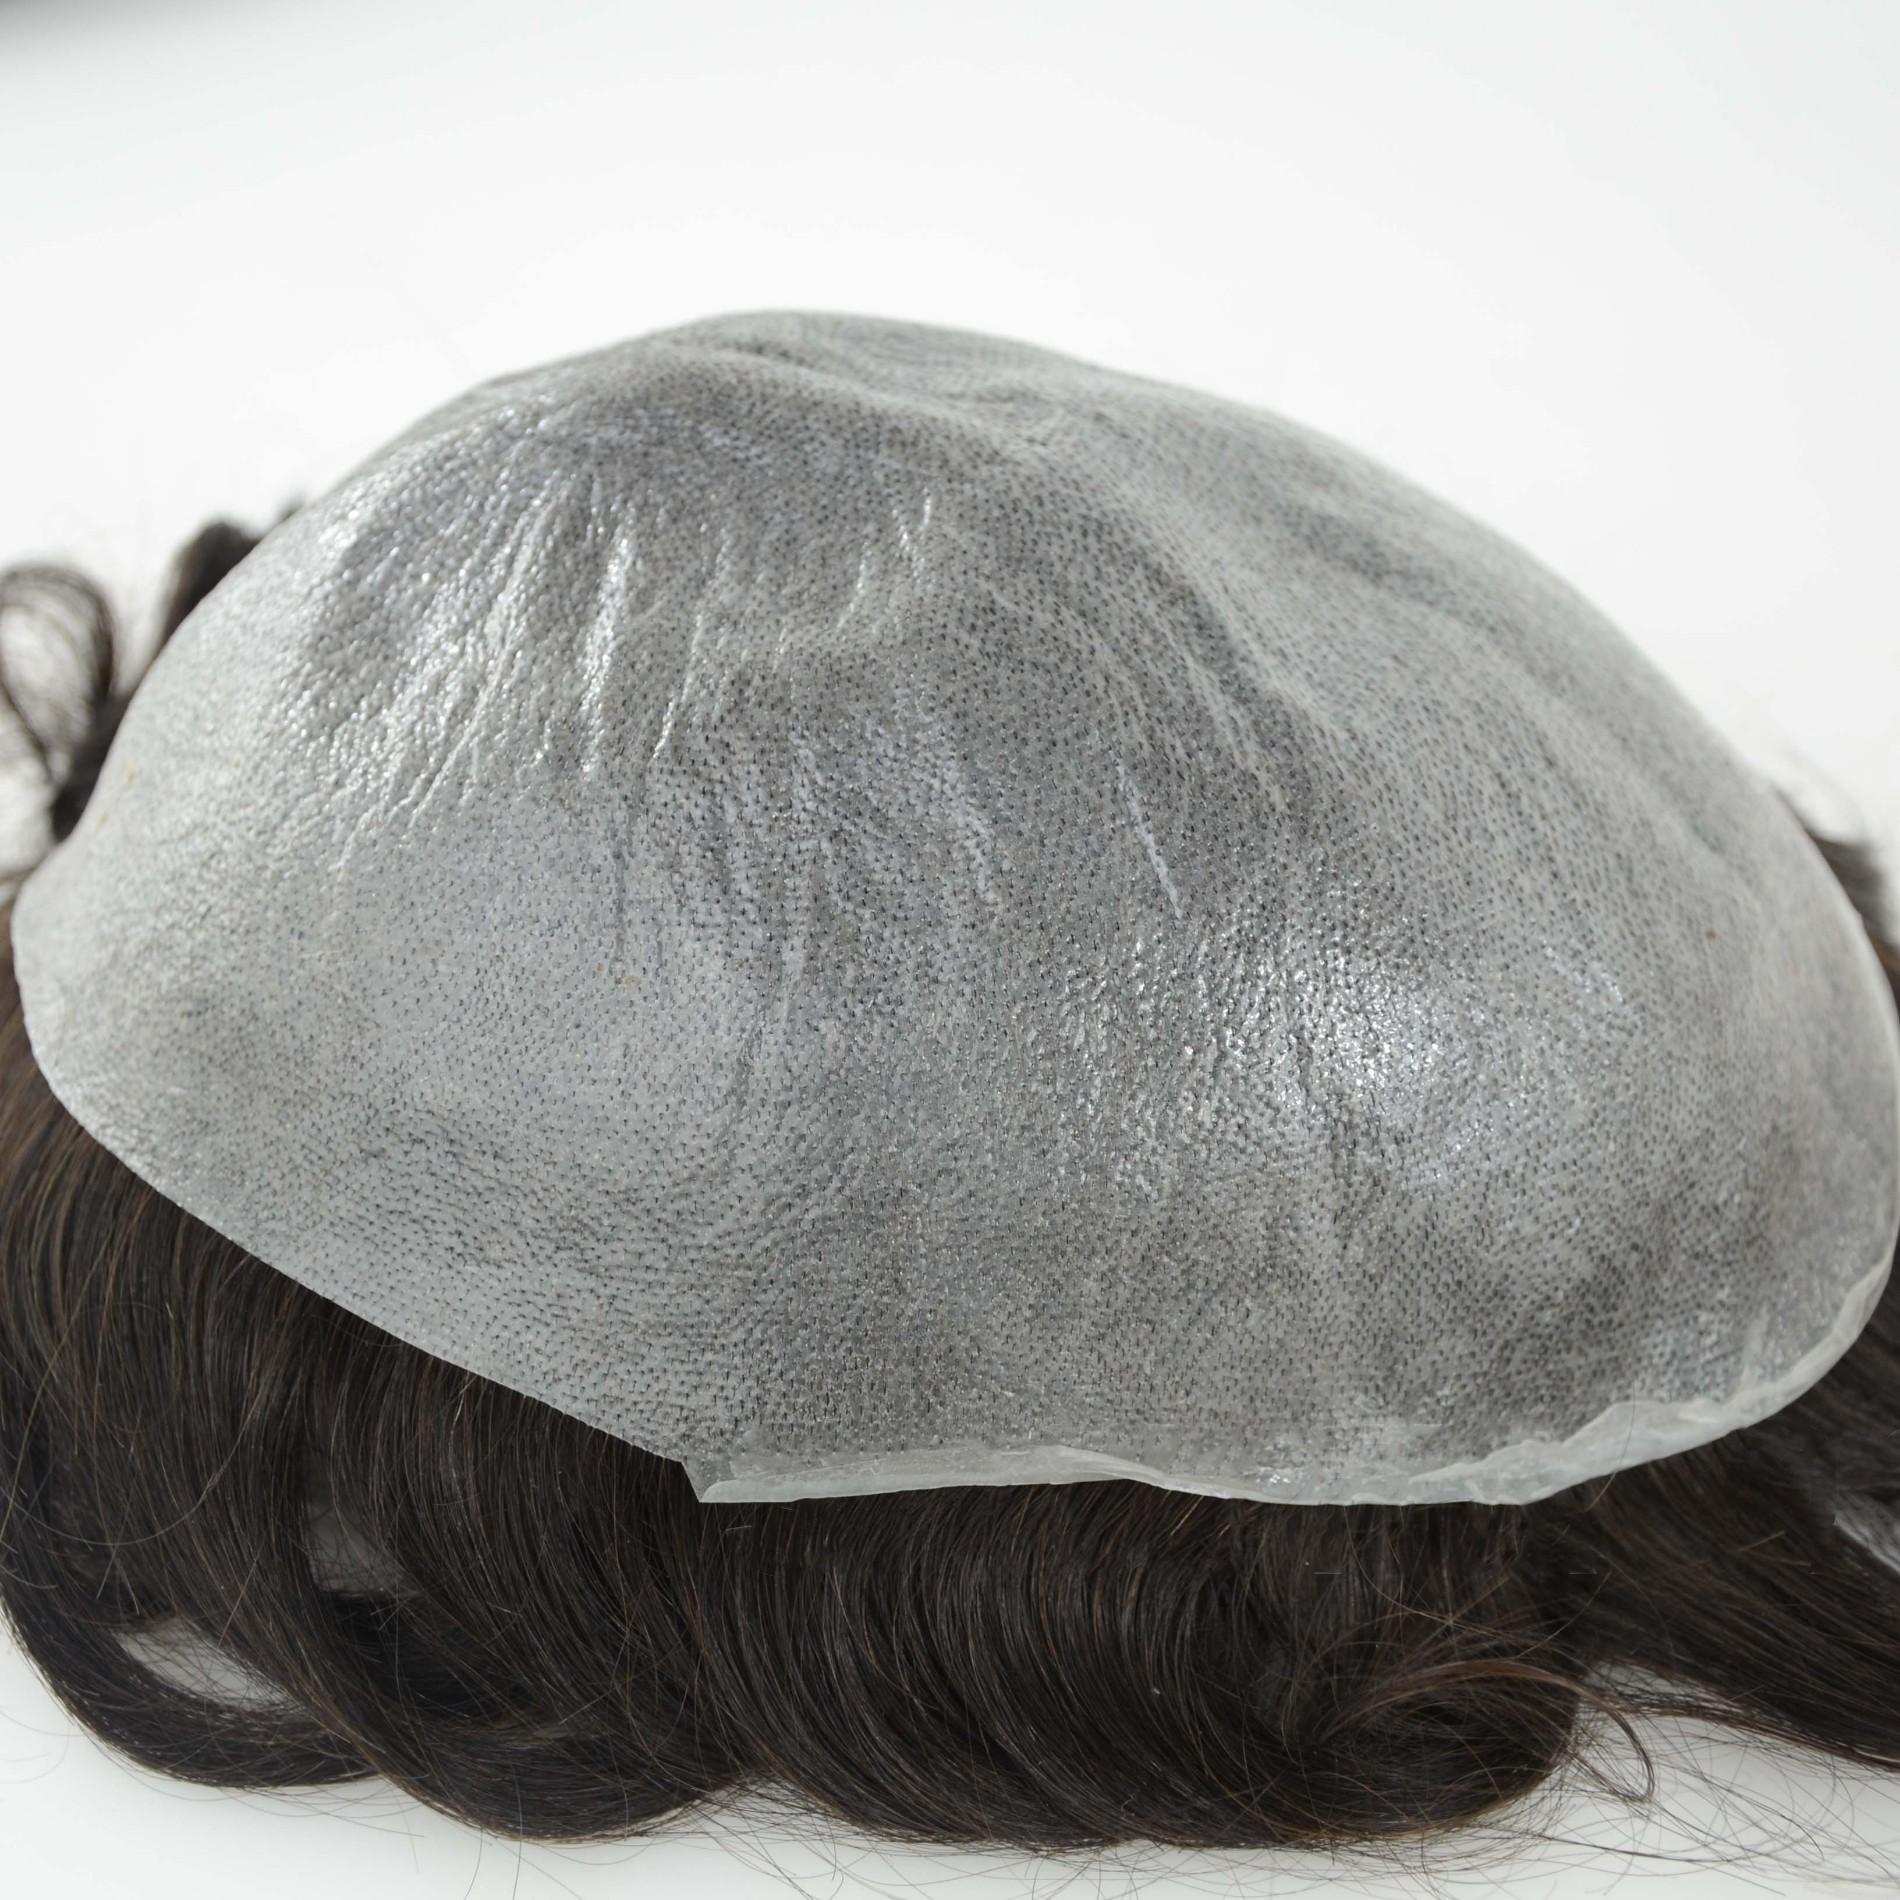 Comprar Peruca de cabelo fina injetada,Peruca de cabelo fina injetada Preço,Peruca de cabelo fina injetada   Marcas,Peruca de cabelo fina injetada Fabricante,Peruca de cabelo fina injetada Mercado,Peruca de cabelo fina injetada Companhia,